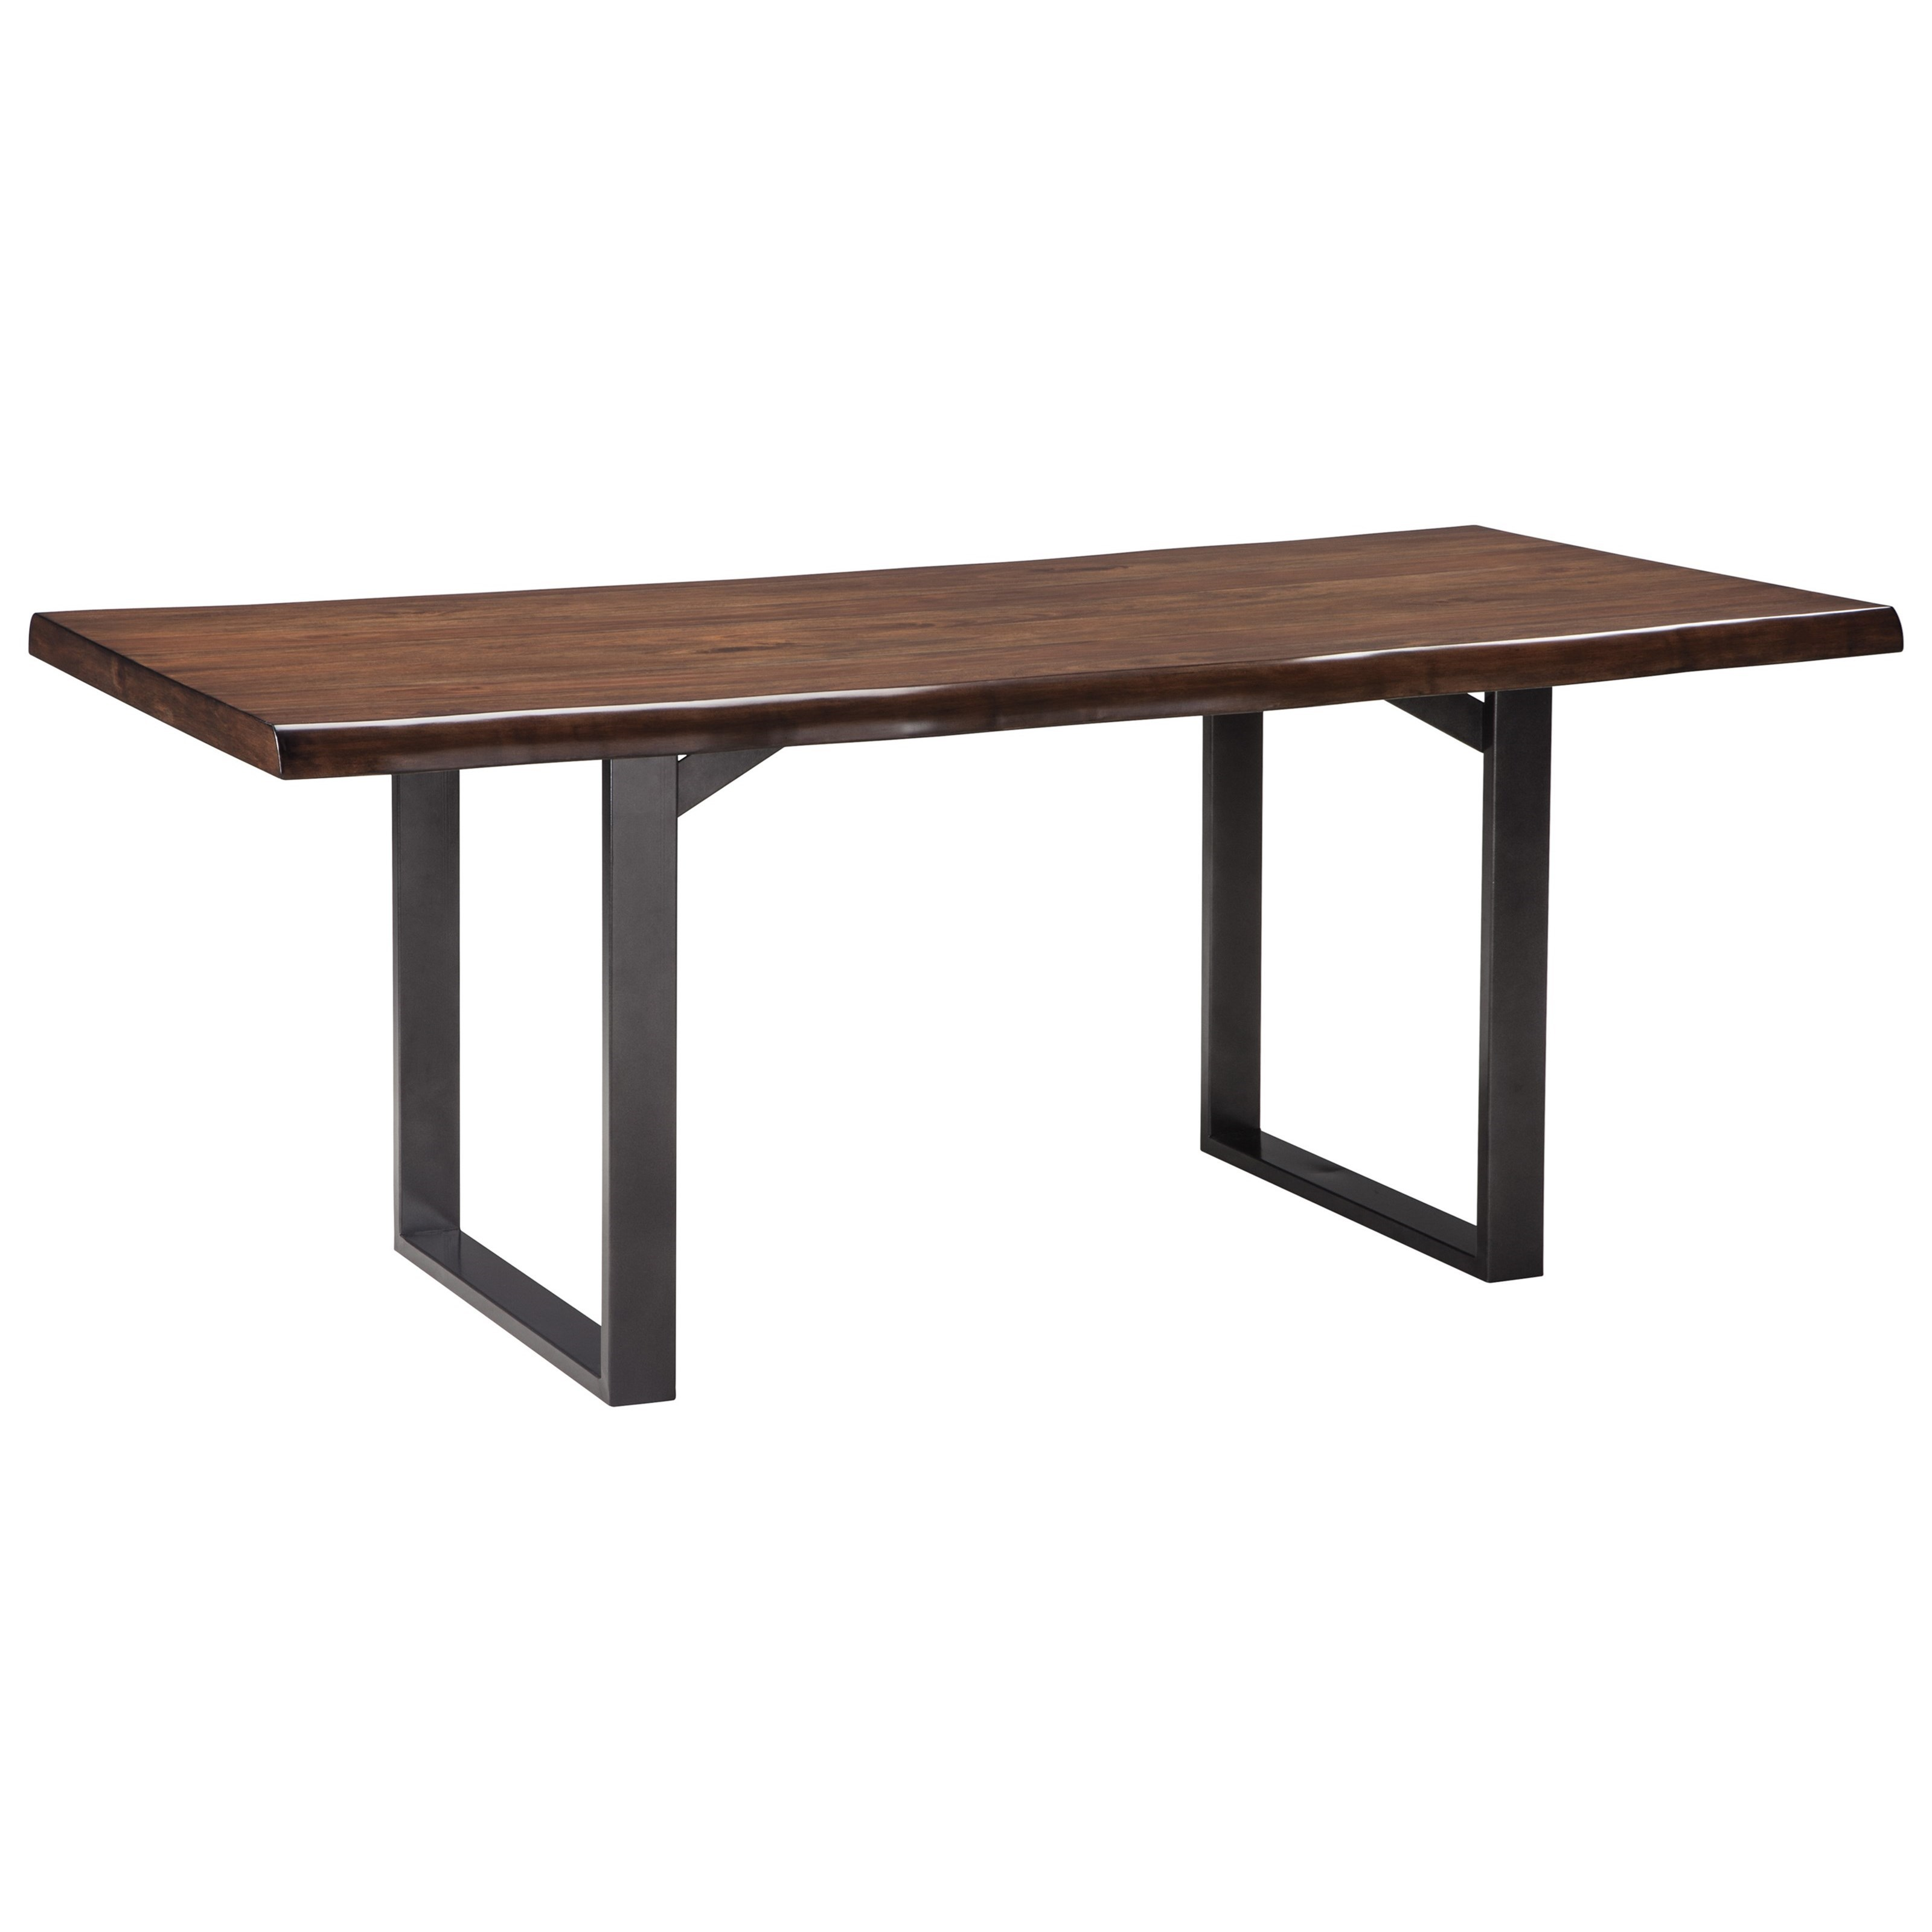 Signature design by ashley esmarina d665 25 rectangular for Ashley furniture dining room table